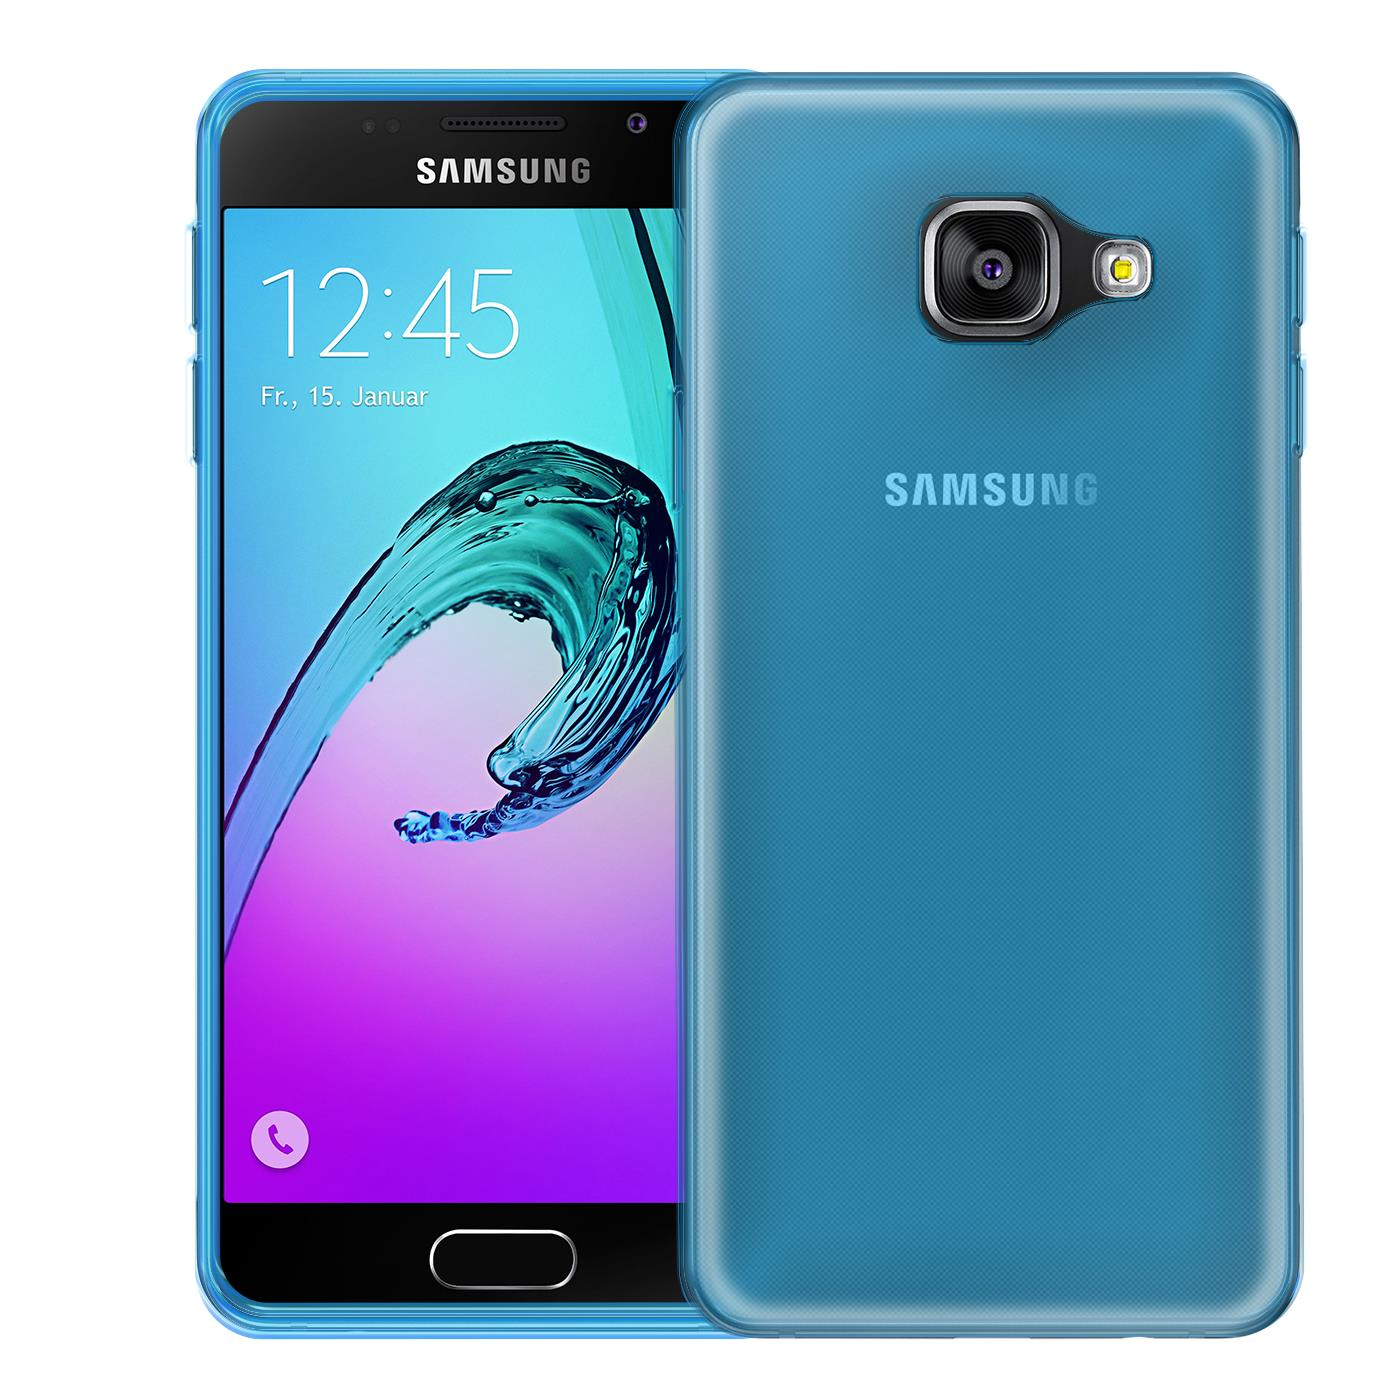 Handy Hülle Samsung Galaxy A5 A510 2016 Case Cover Schutz ...